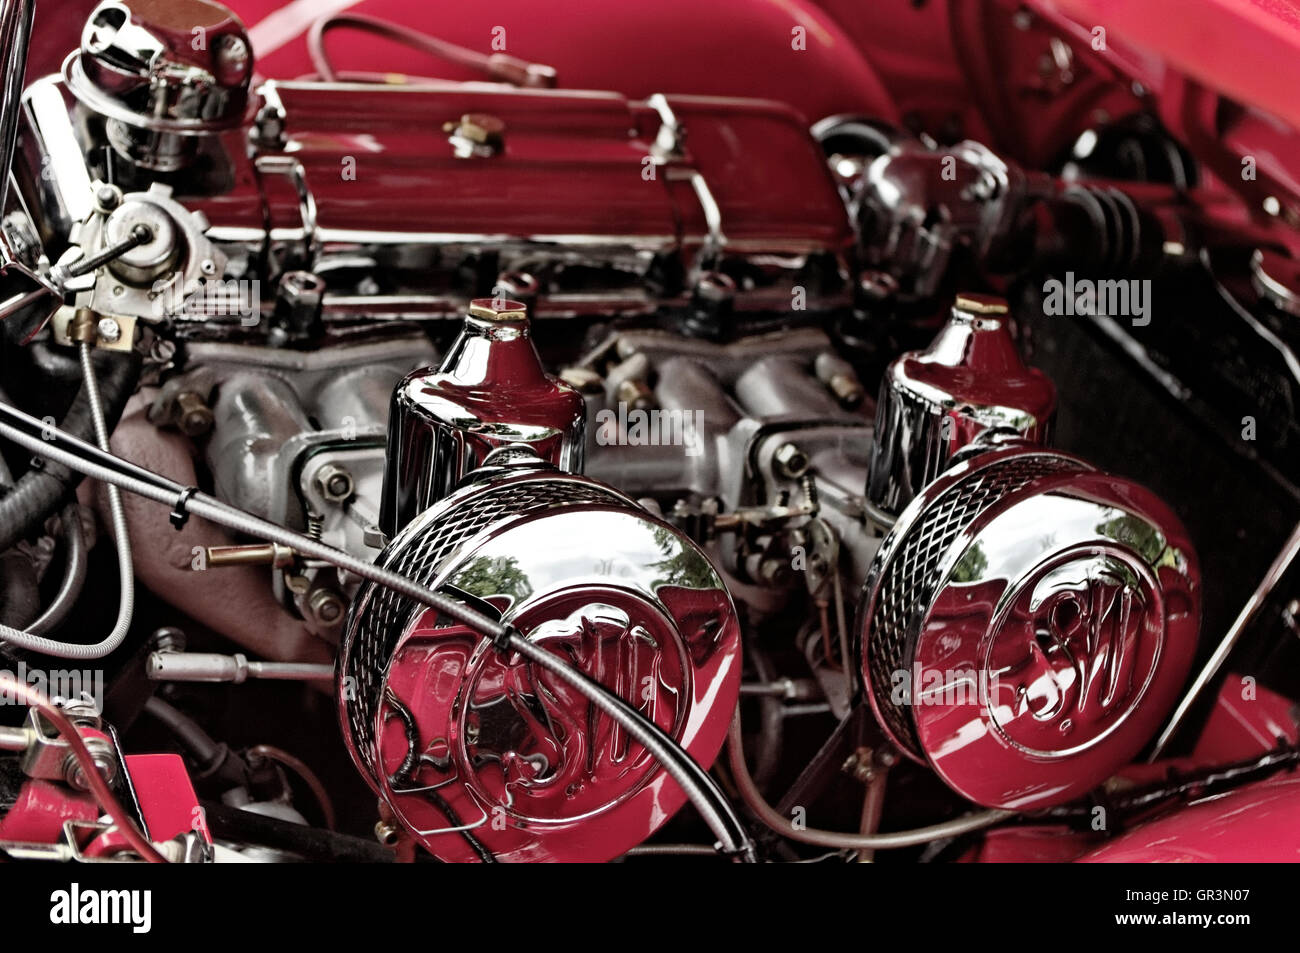 Car engine - Stock Image